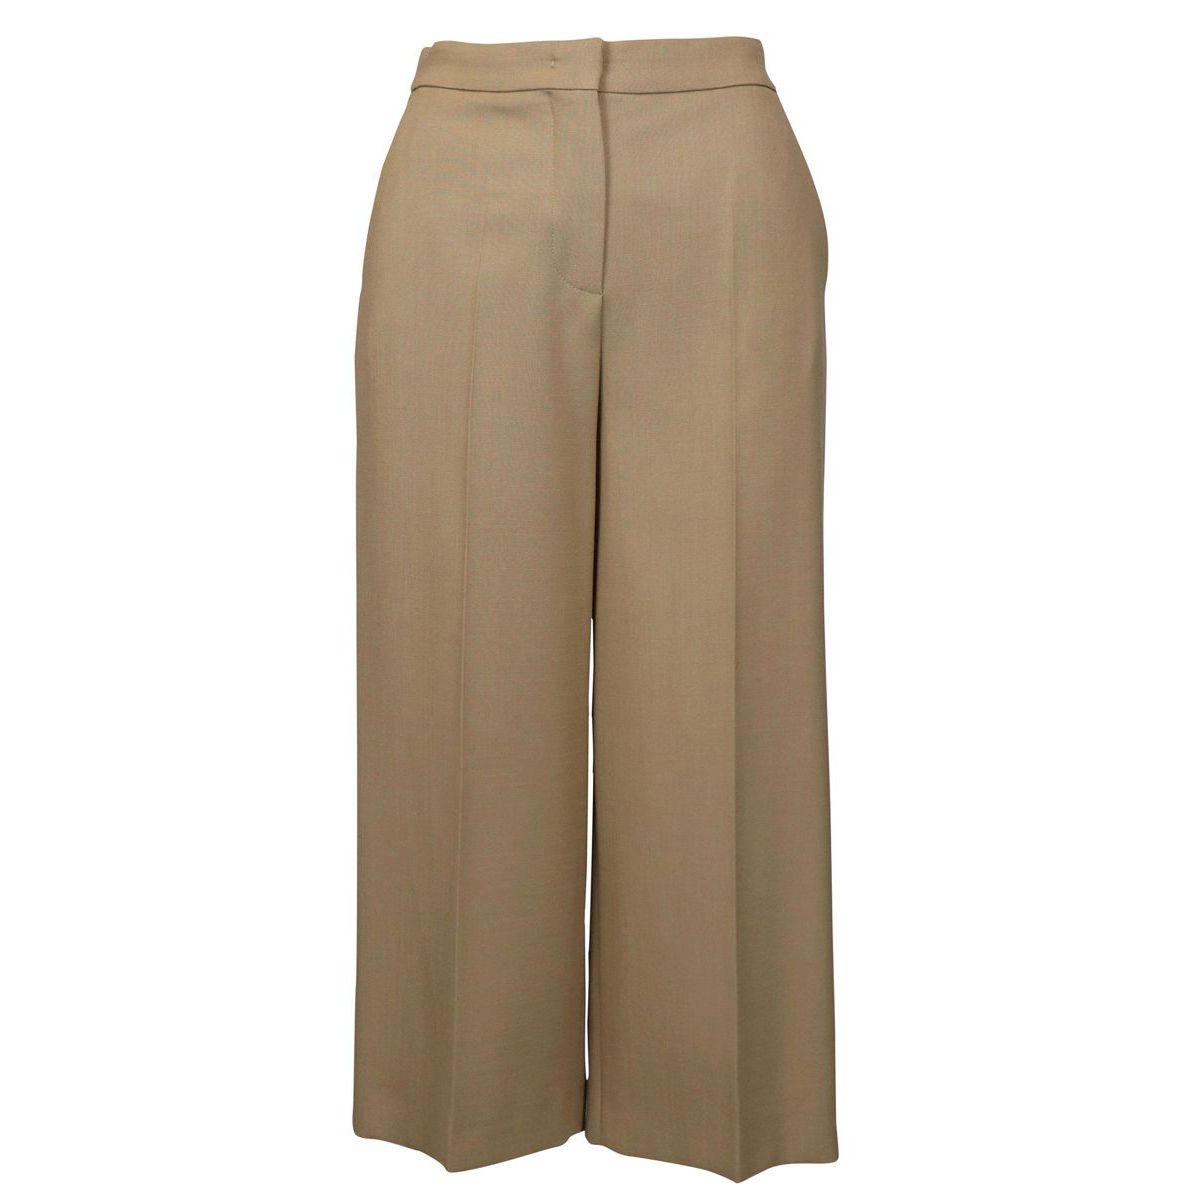 ORFEO stretch virgin wool trousers Camel Max Mara